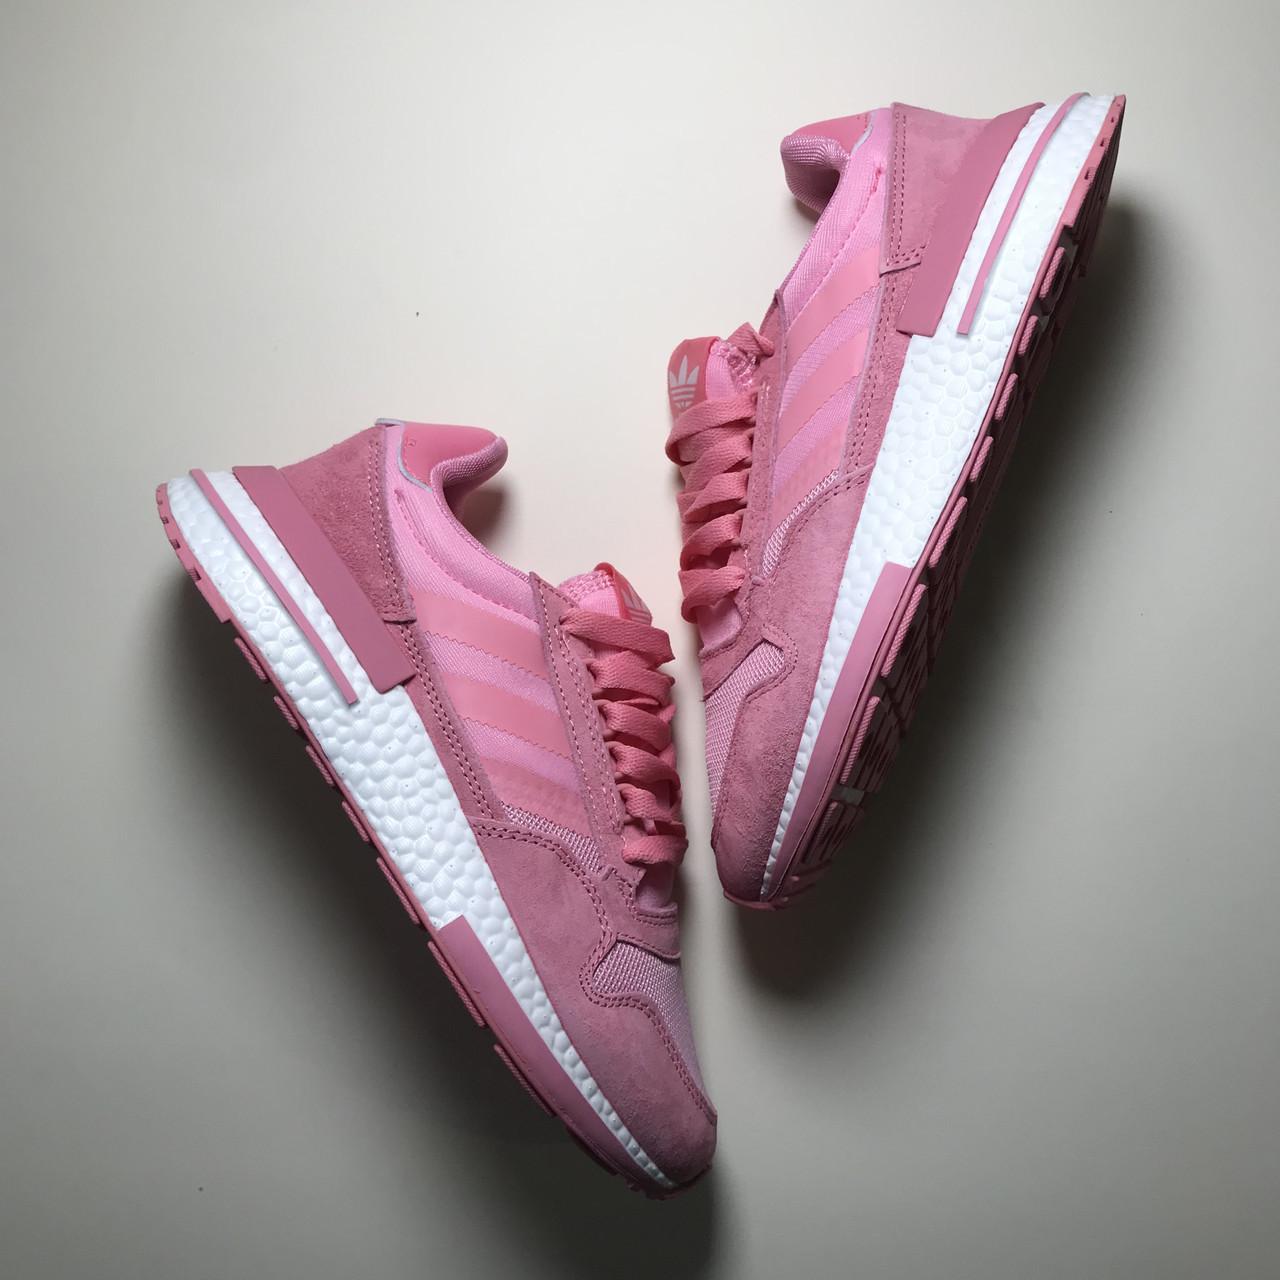 Кроссовки Adidas ZX 500 RM Pink